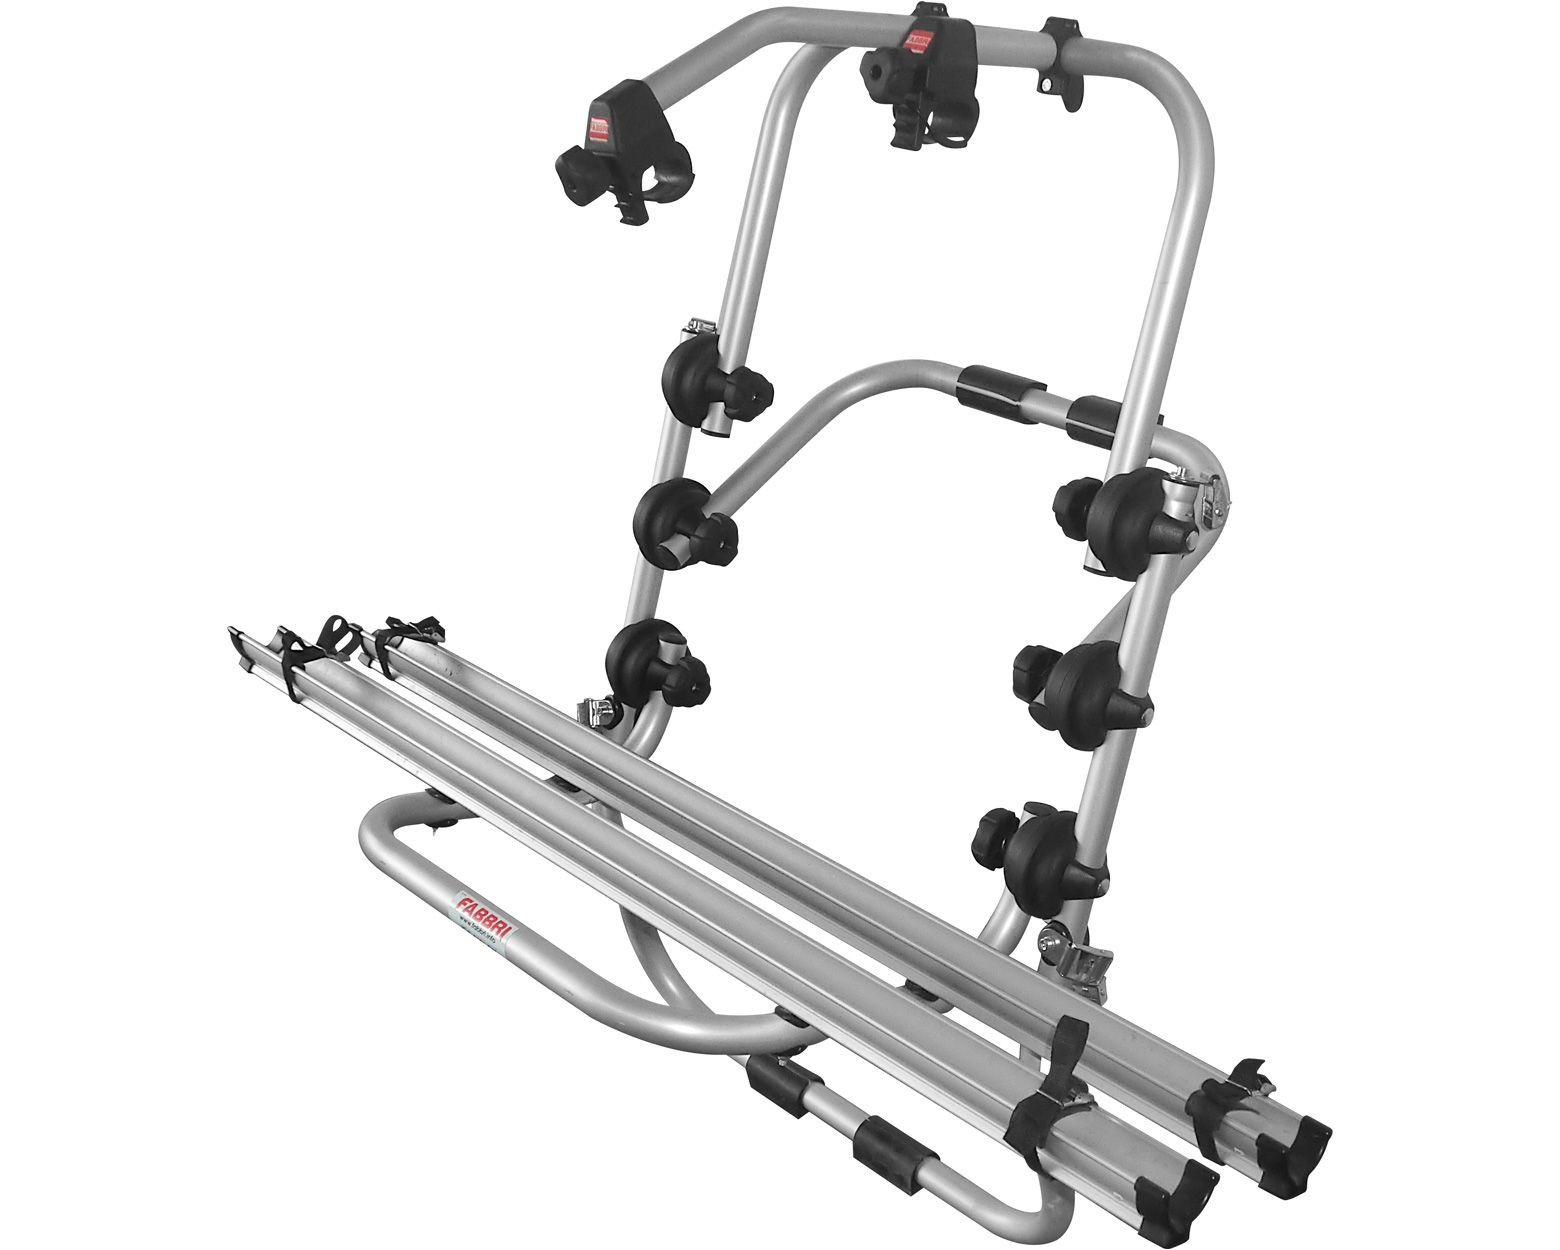 BICI OK 2 includes adapter Rear bikeracks to